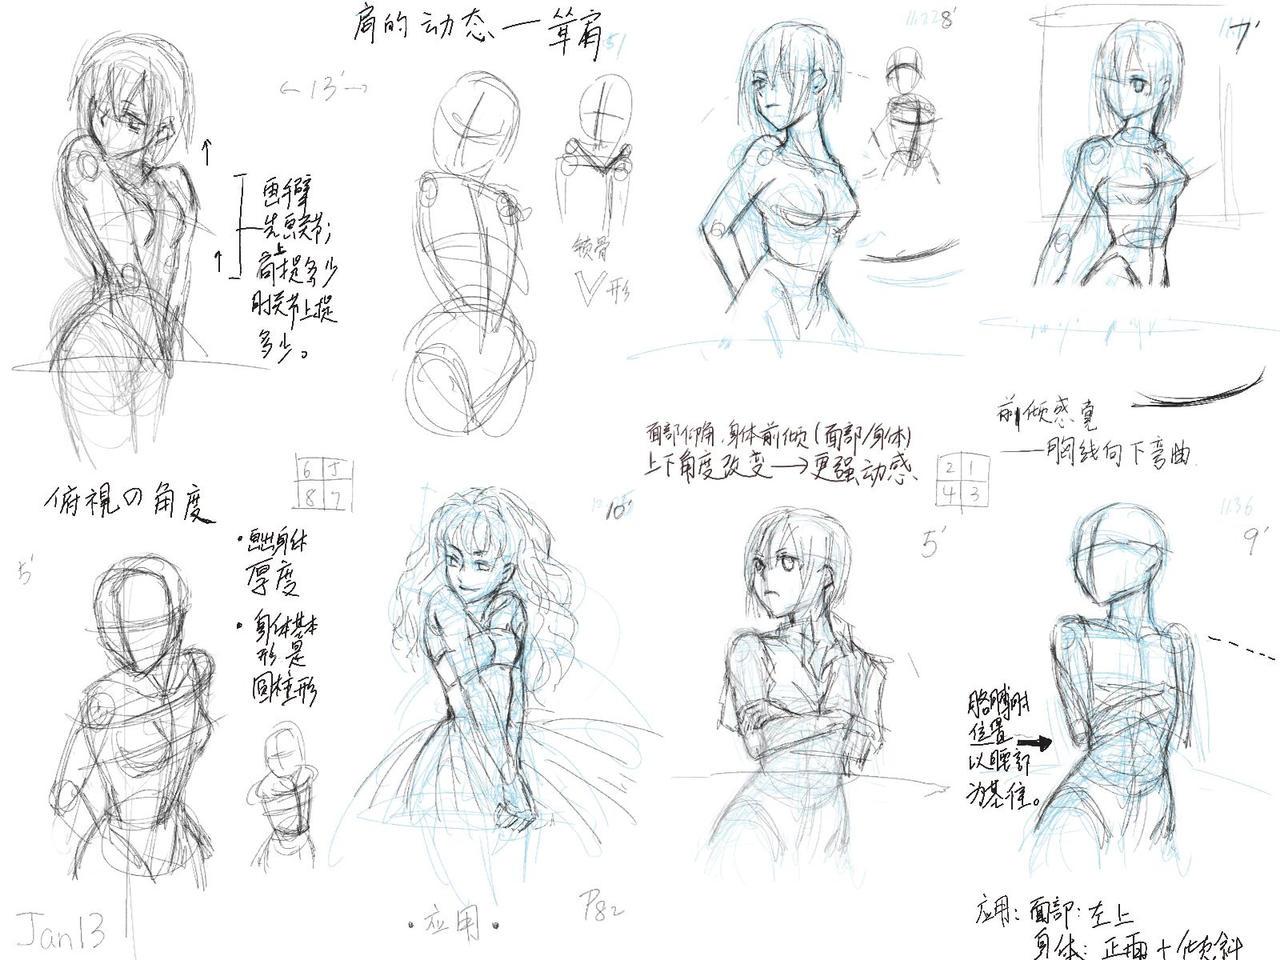 anime figure drawing8 by rainyseason on deviantart